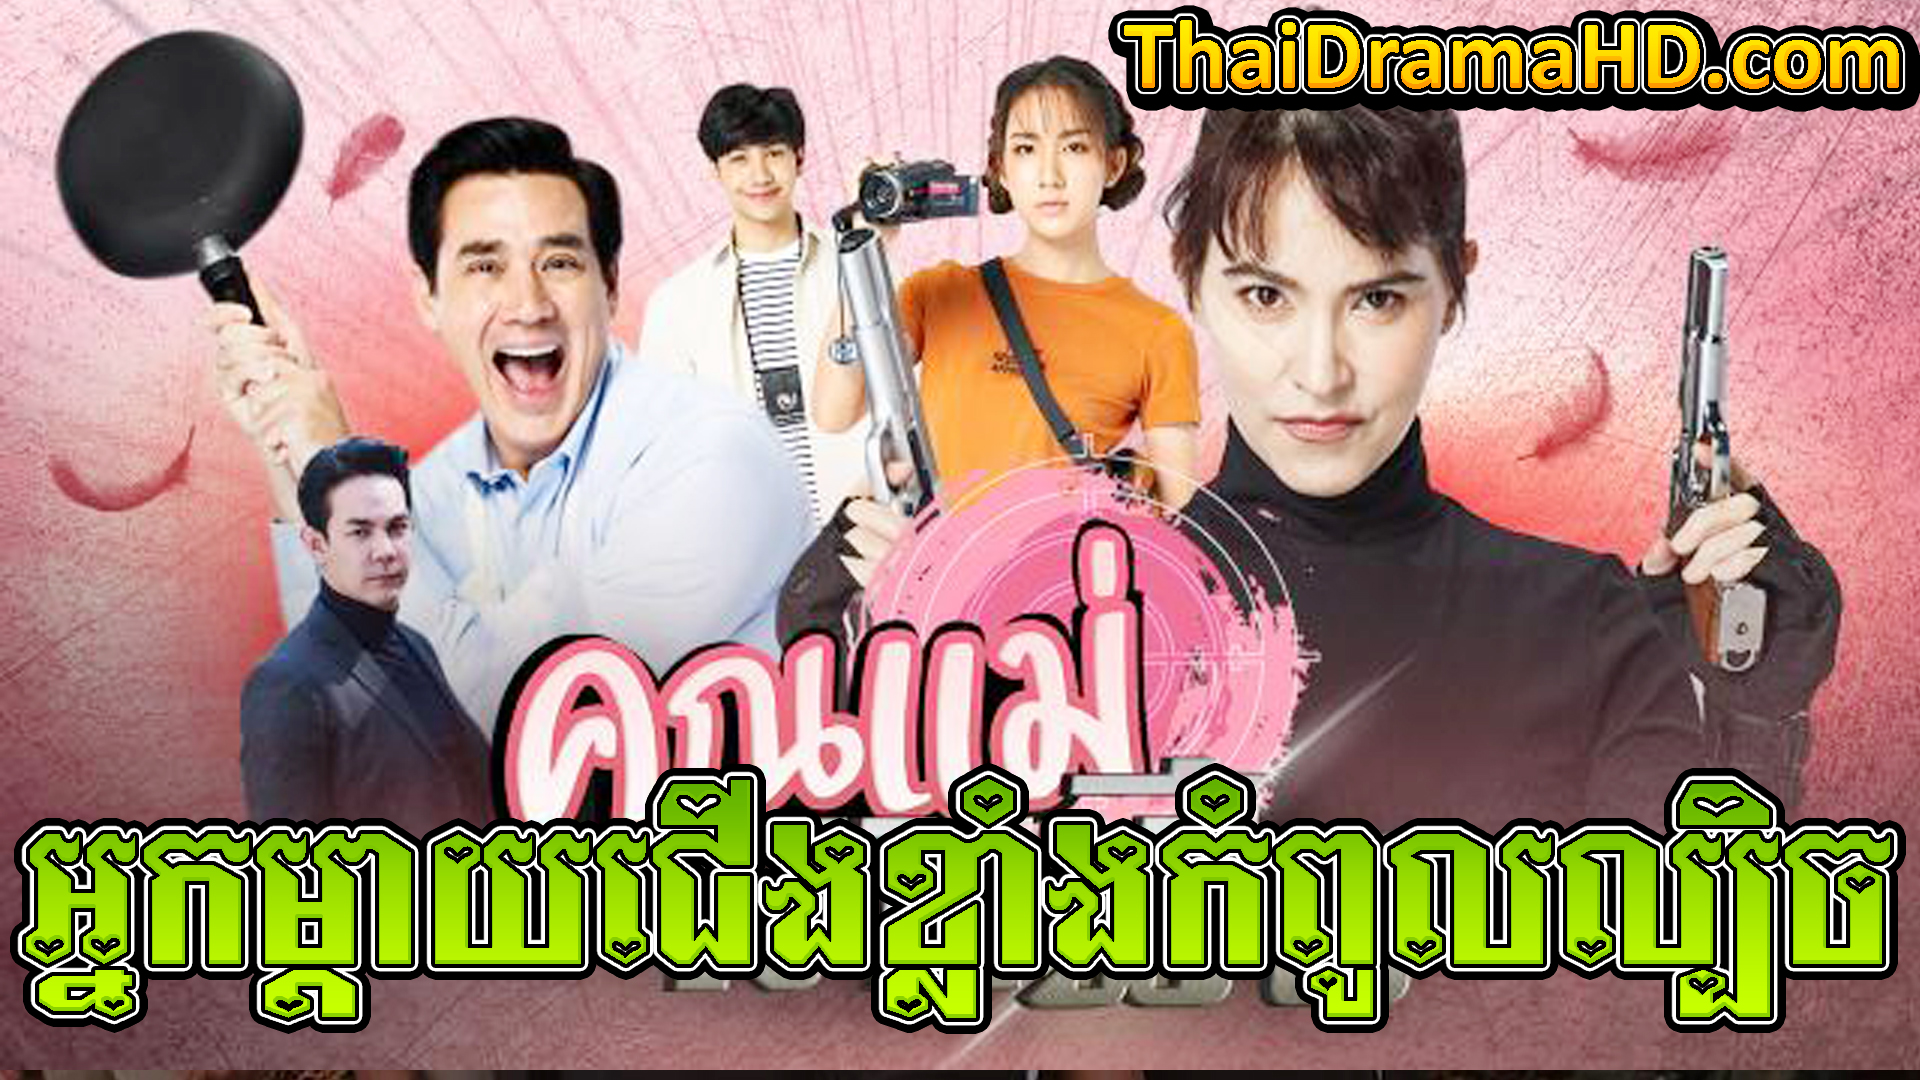 Nak Mday Cheung Khlang Kampoul Lbech, Thai Drama, Thai Drama HD, Khmer Movie, Phumikhmer, Phumikhmer1, movie-khmer, video4khmer, khmotions, kolabkhmer, khmer drama, ksdrama, cookingtips, roscheat, khmertimeskh, khmerkomsan, phumi7, merlkon, film2us, movie2kh, sweetdrama, khmercitylove, khreplay, tvb cambodia drama, ckh7, srokthai, phumimedia, phumi8, khmer avenue, khmer search, Soyo, khmerfans